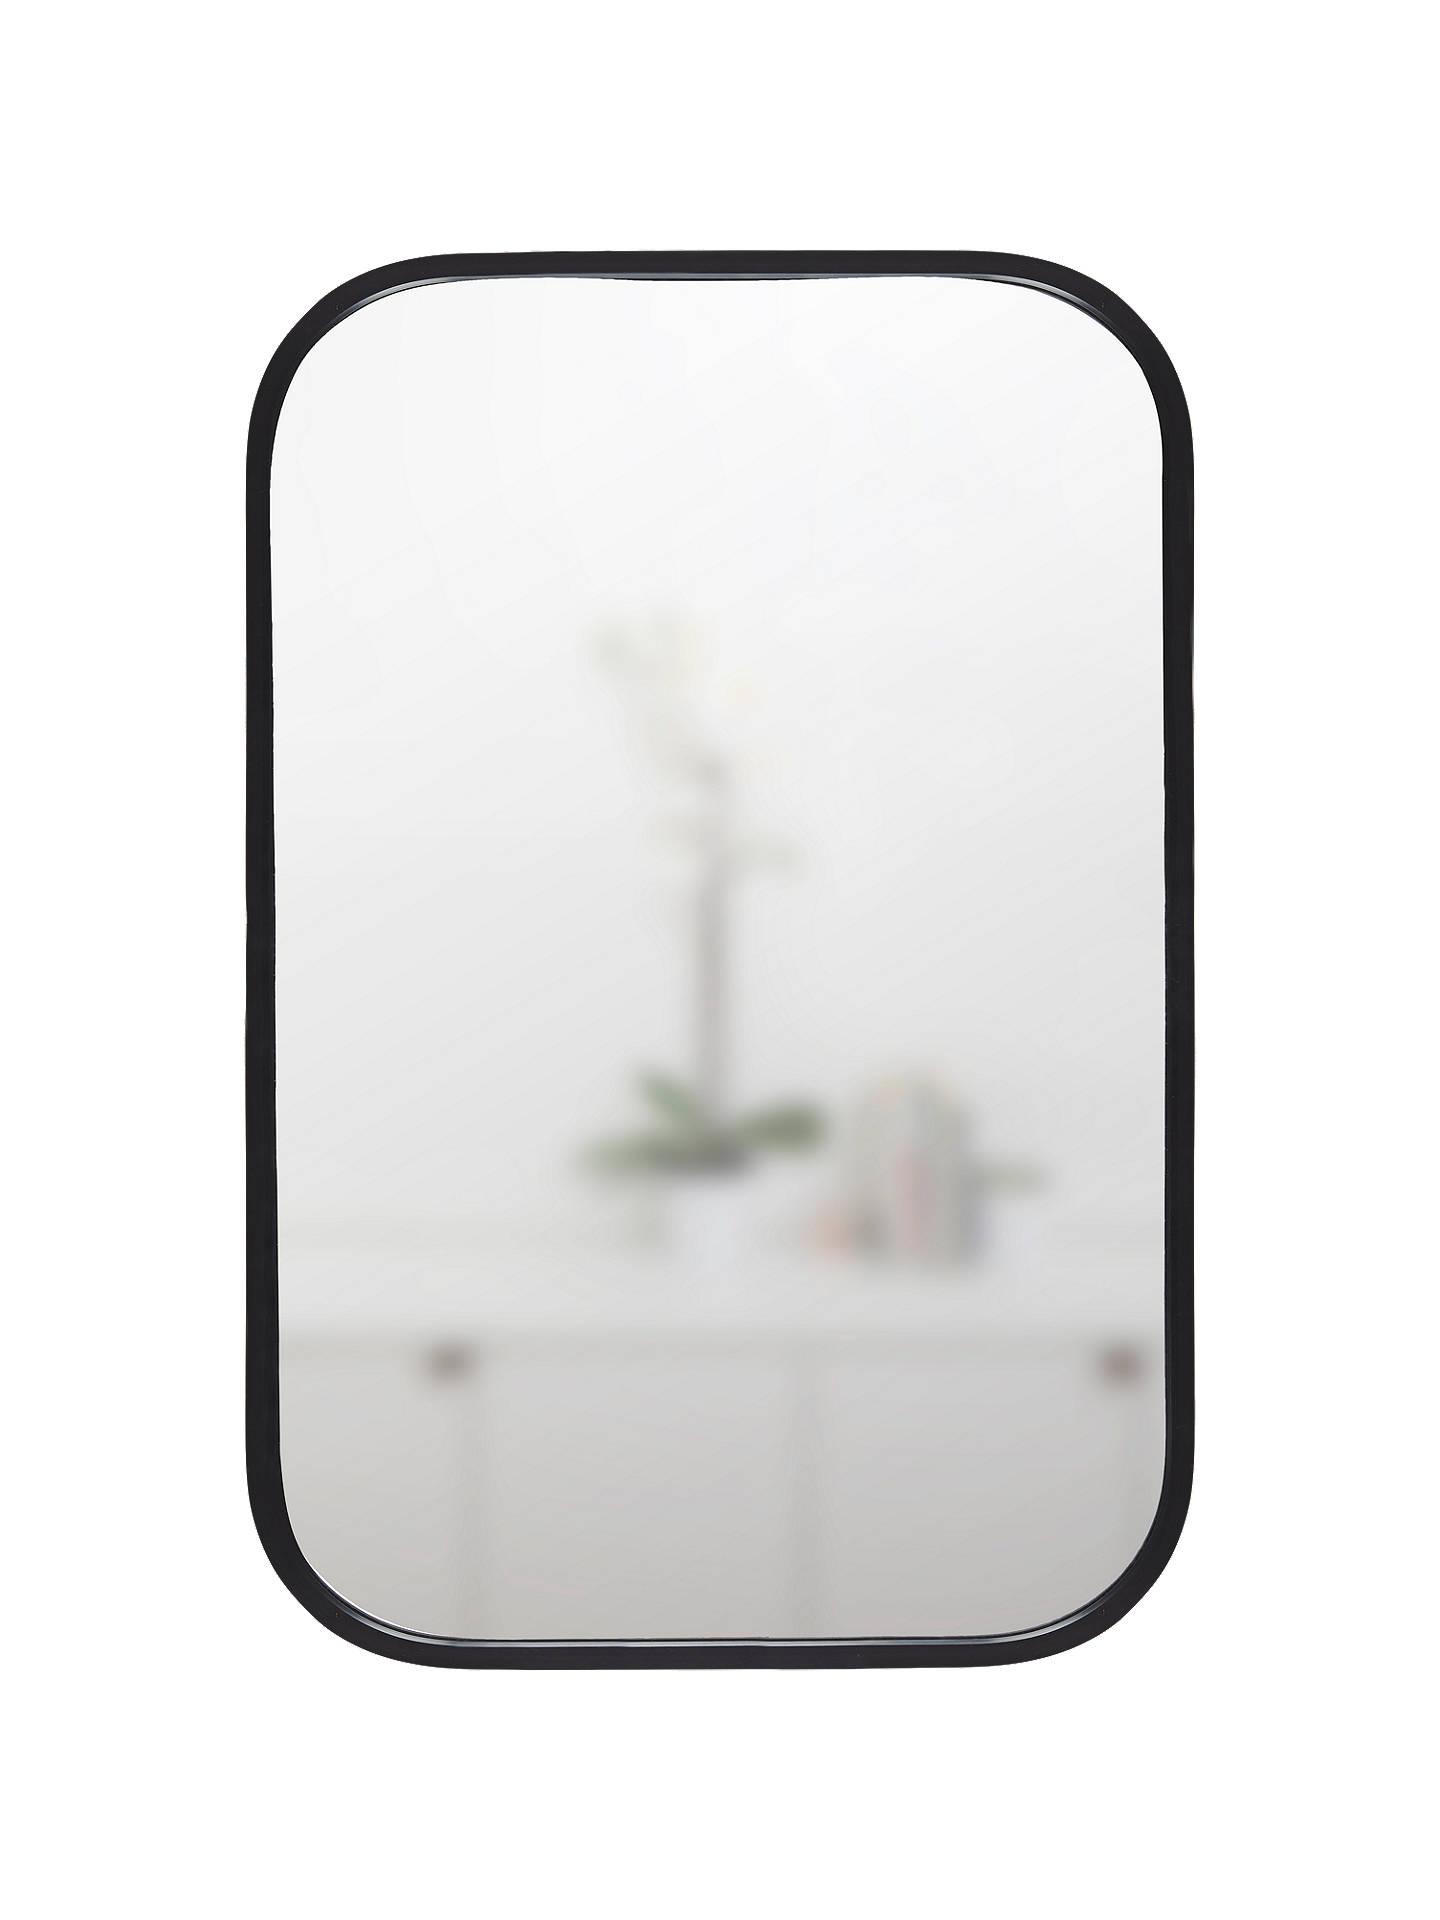 Umbra Rounded Corners Mirror H93cm Black At John Lewis